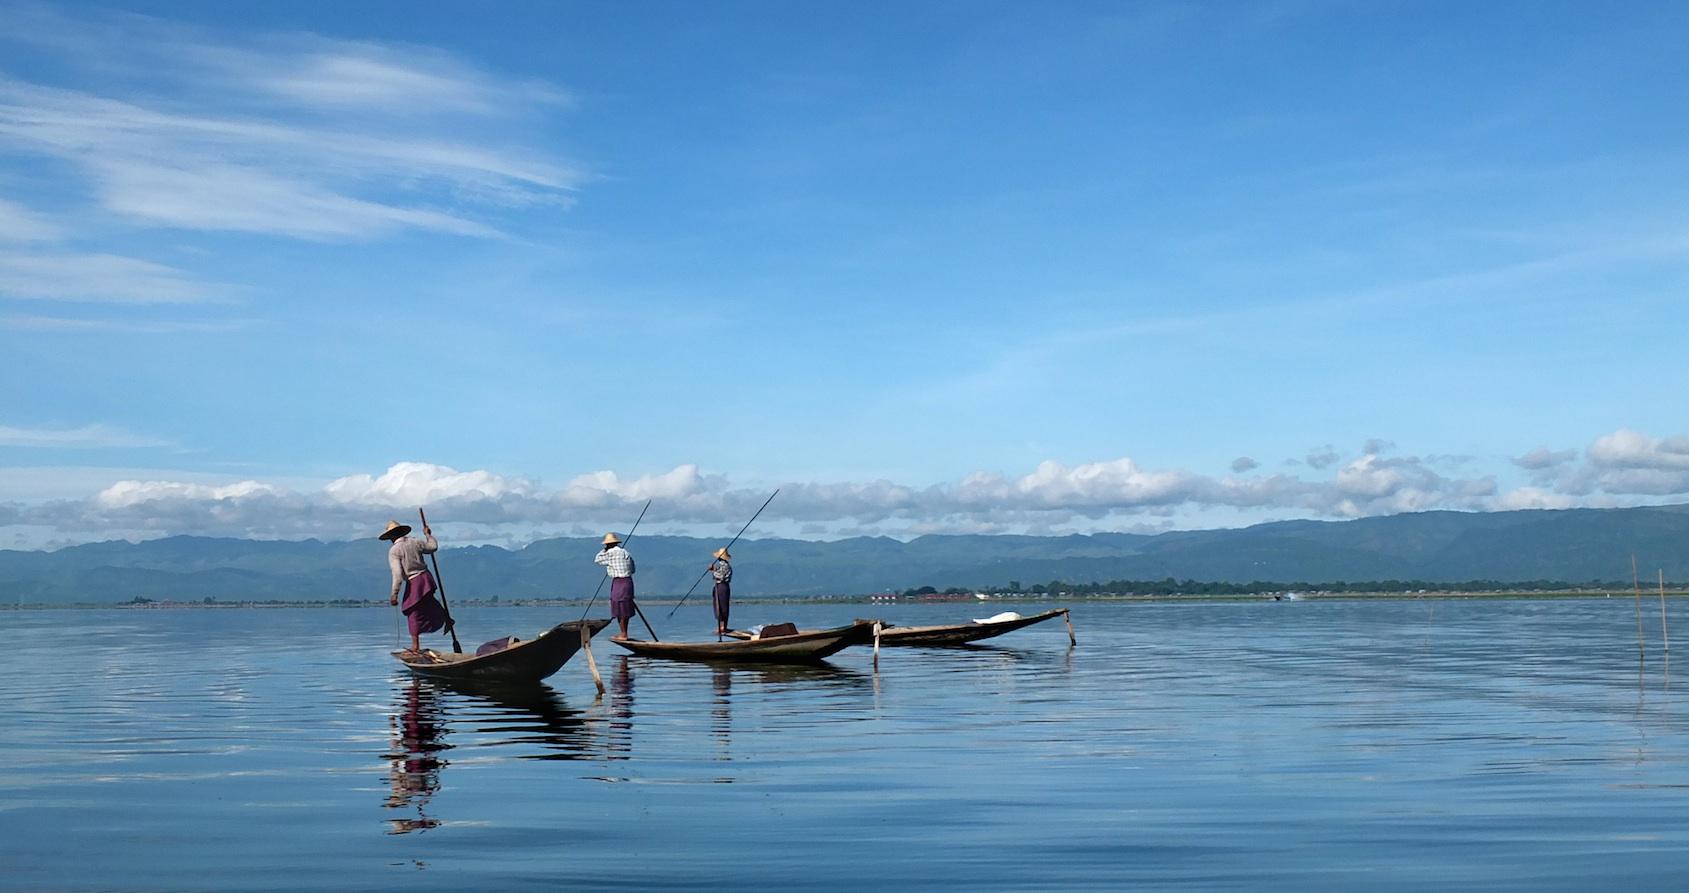 birmanie-pecheurs-une-ulyces